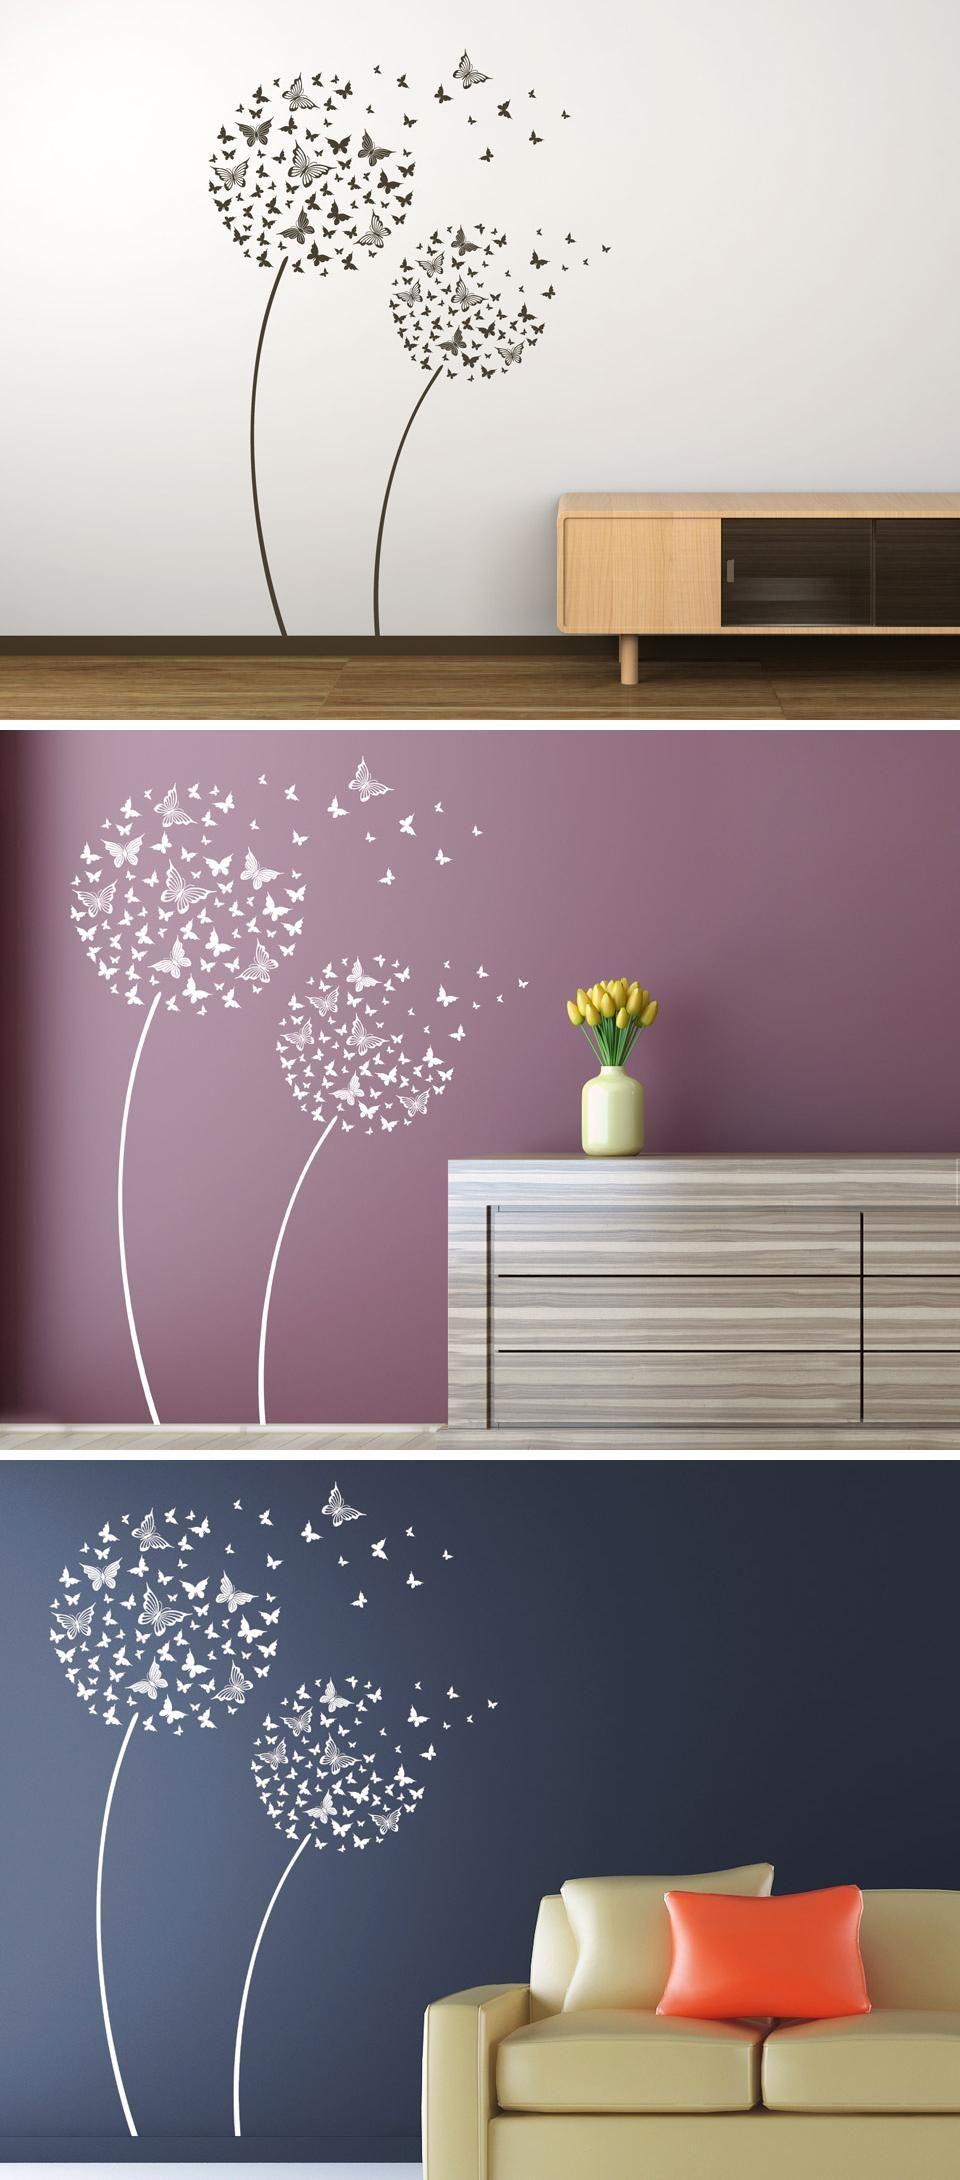 Wandtattoo Schmetterlingsblumen Wandtattoo Blumen Wandtattoo Kinderzimmer Wandtattoo Wohnzimmer